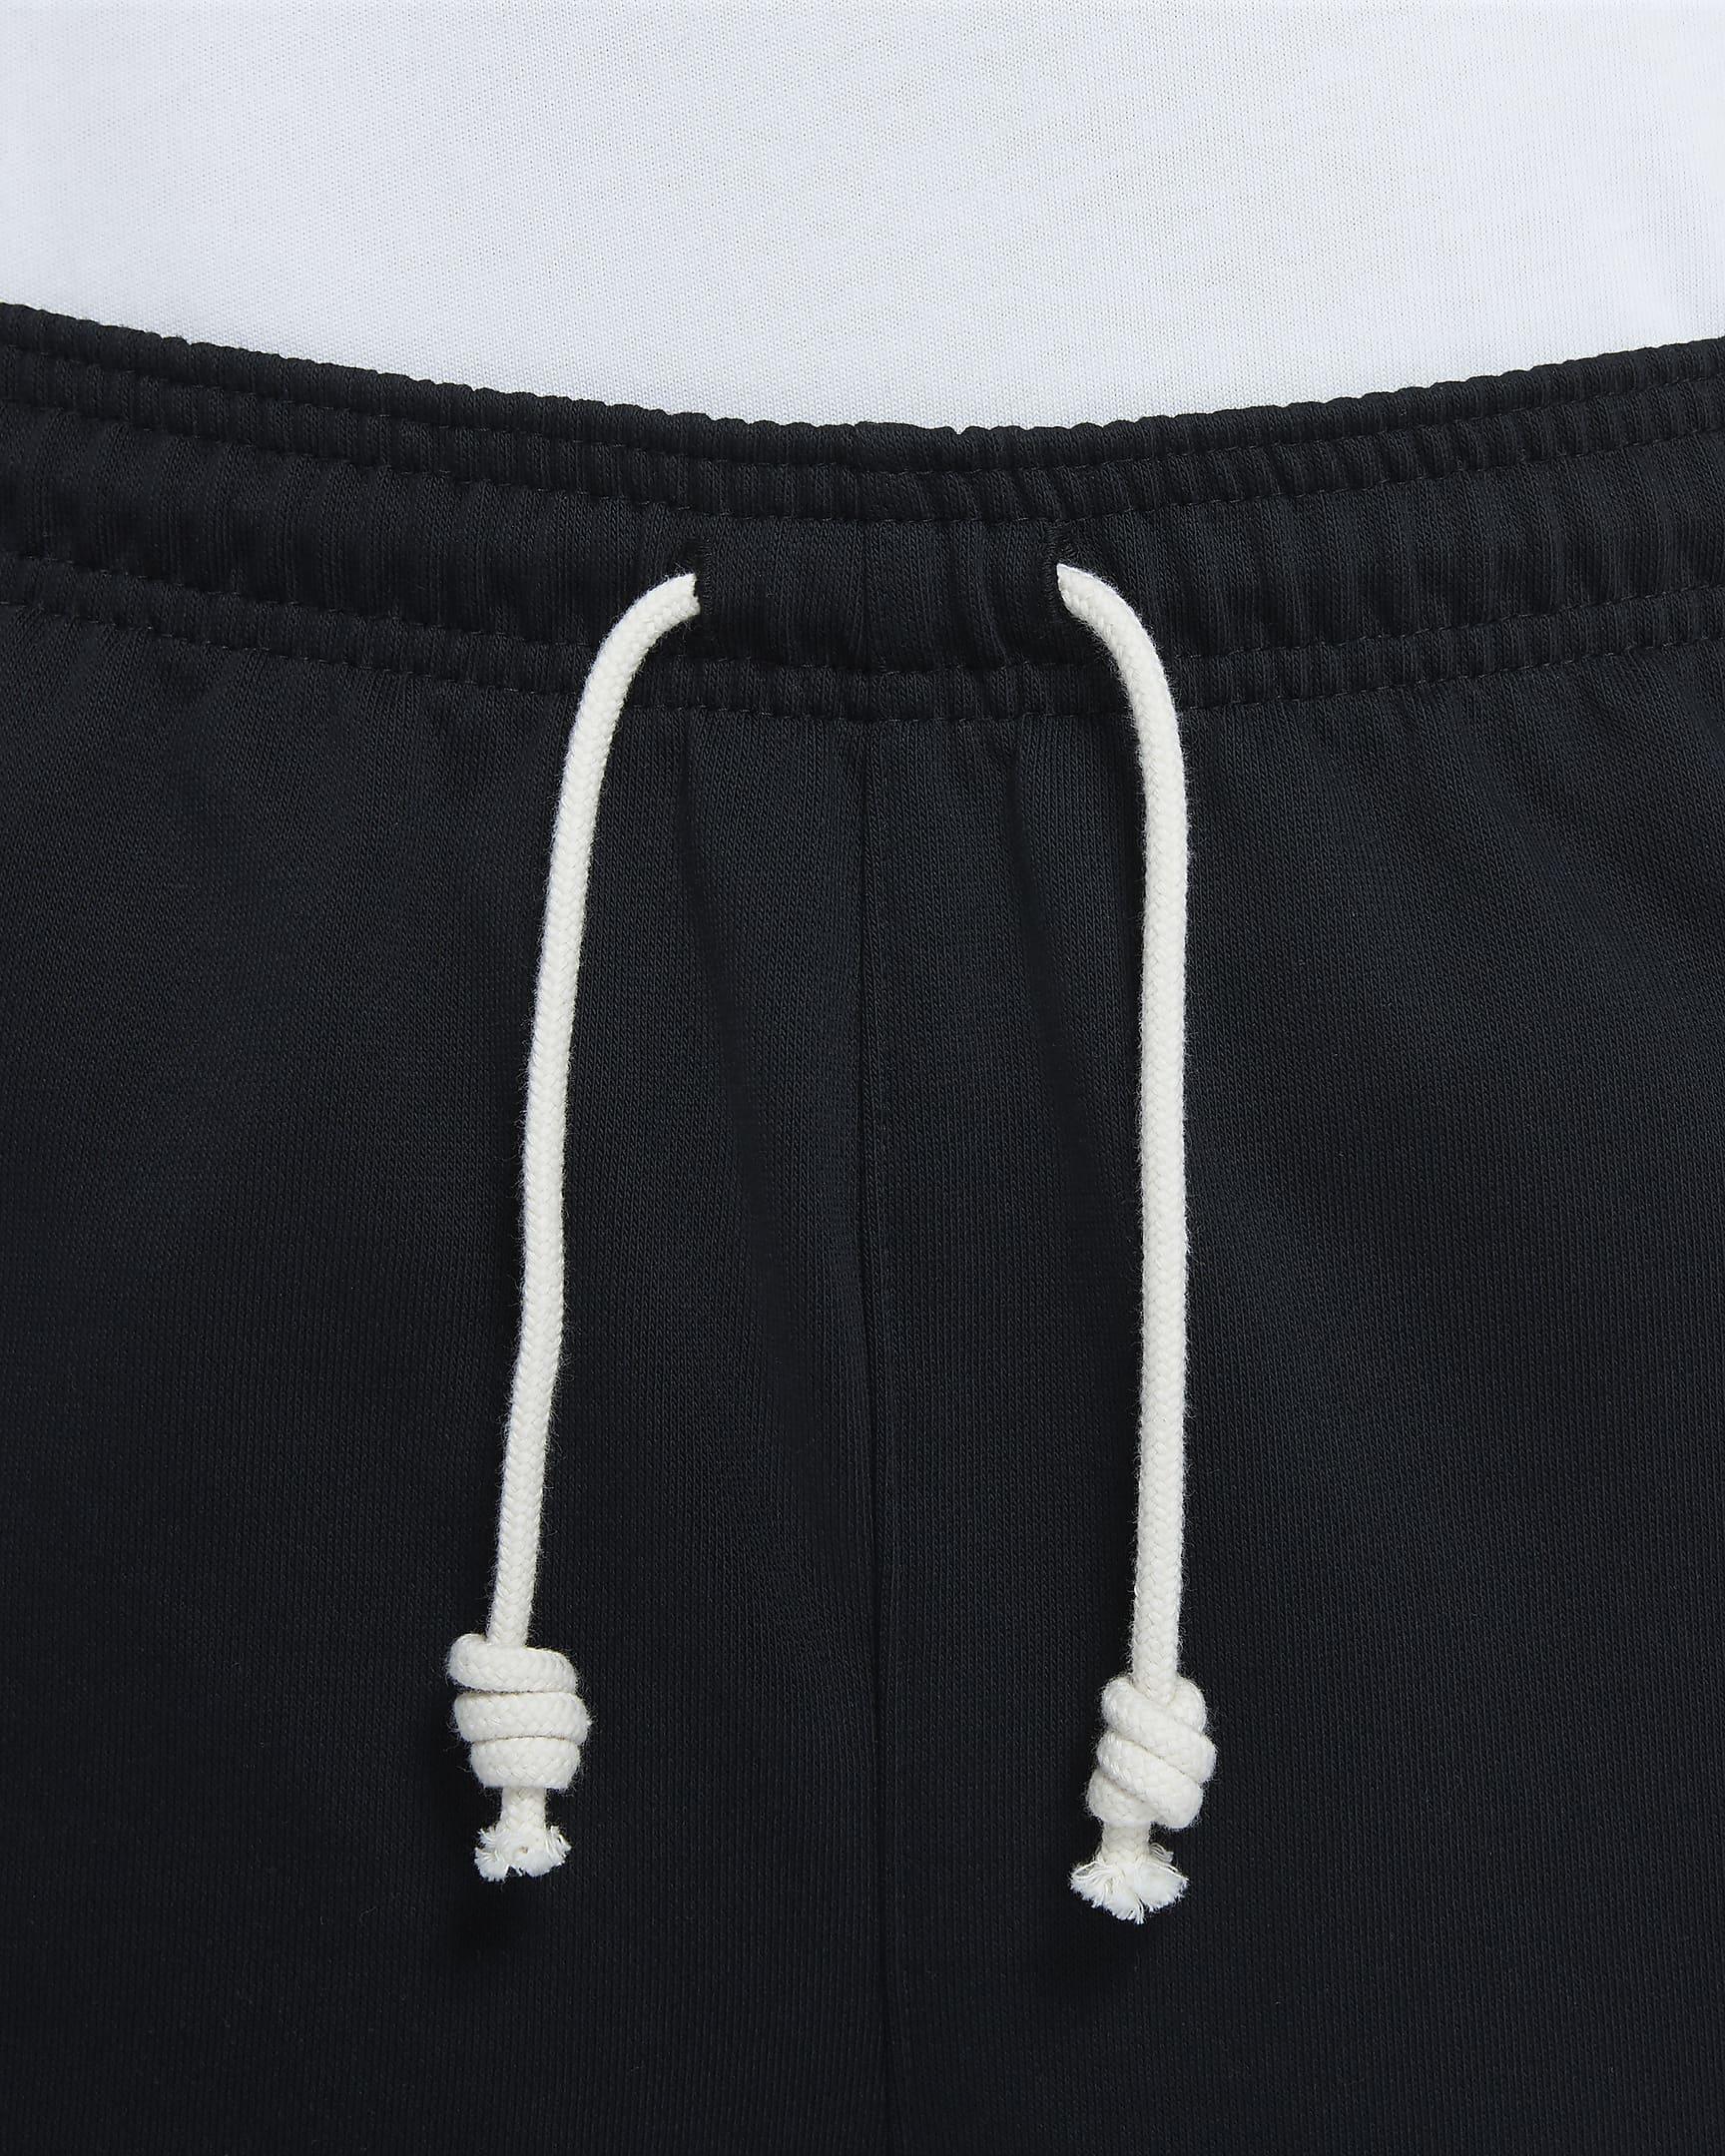 dri-fit-rayguns-mens-premium-basketball-shorts-V329rk-6